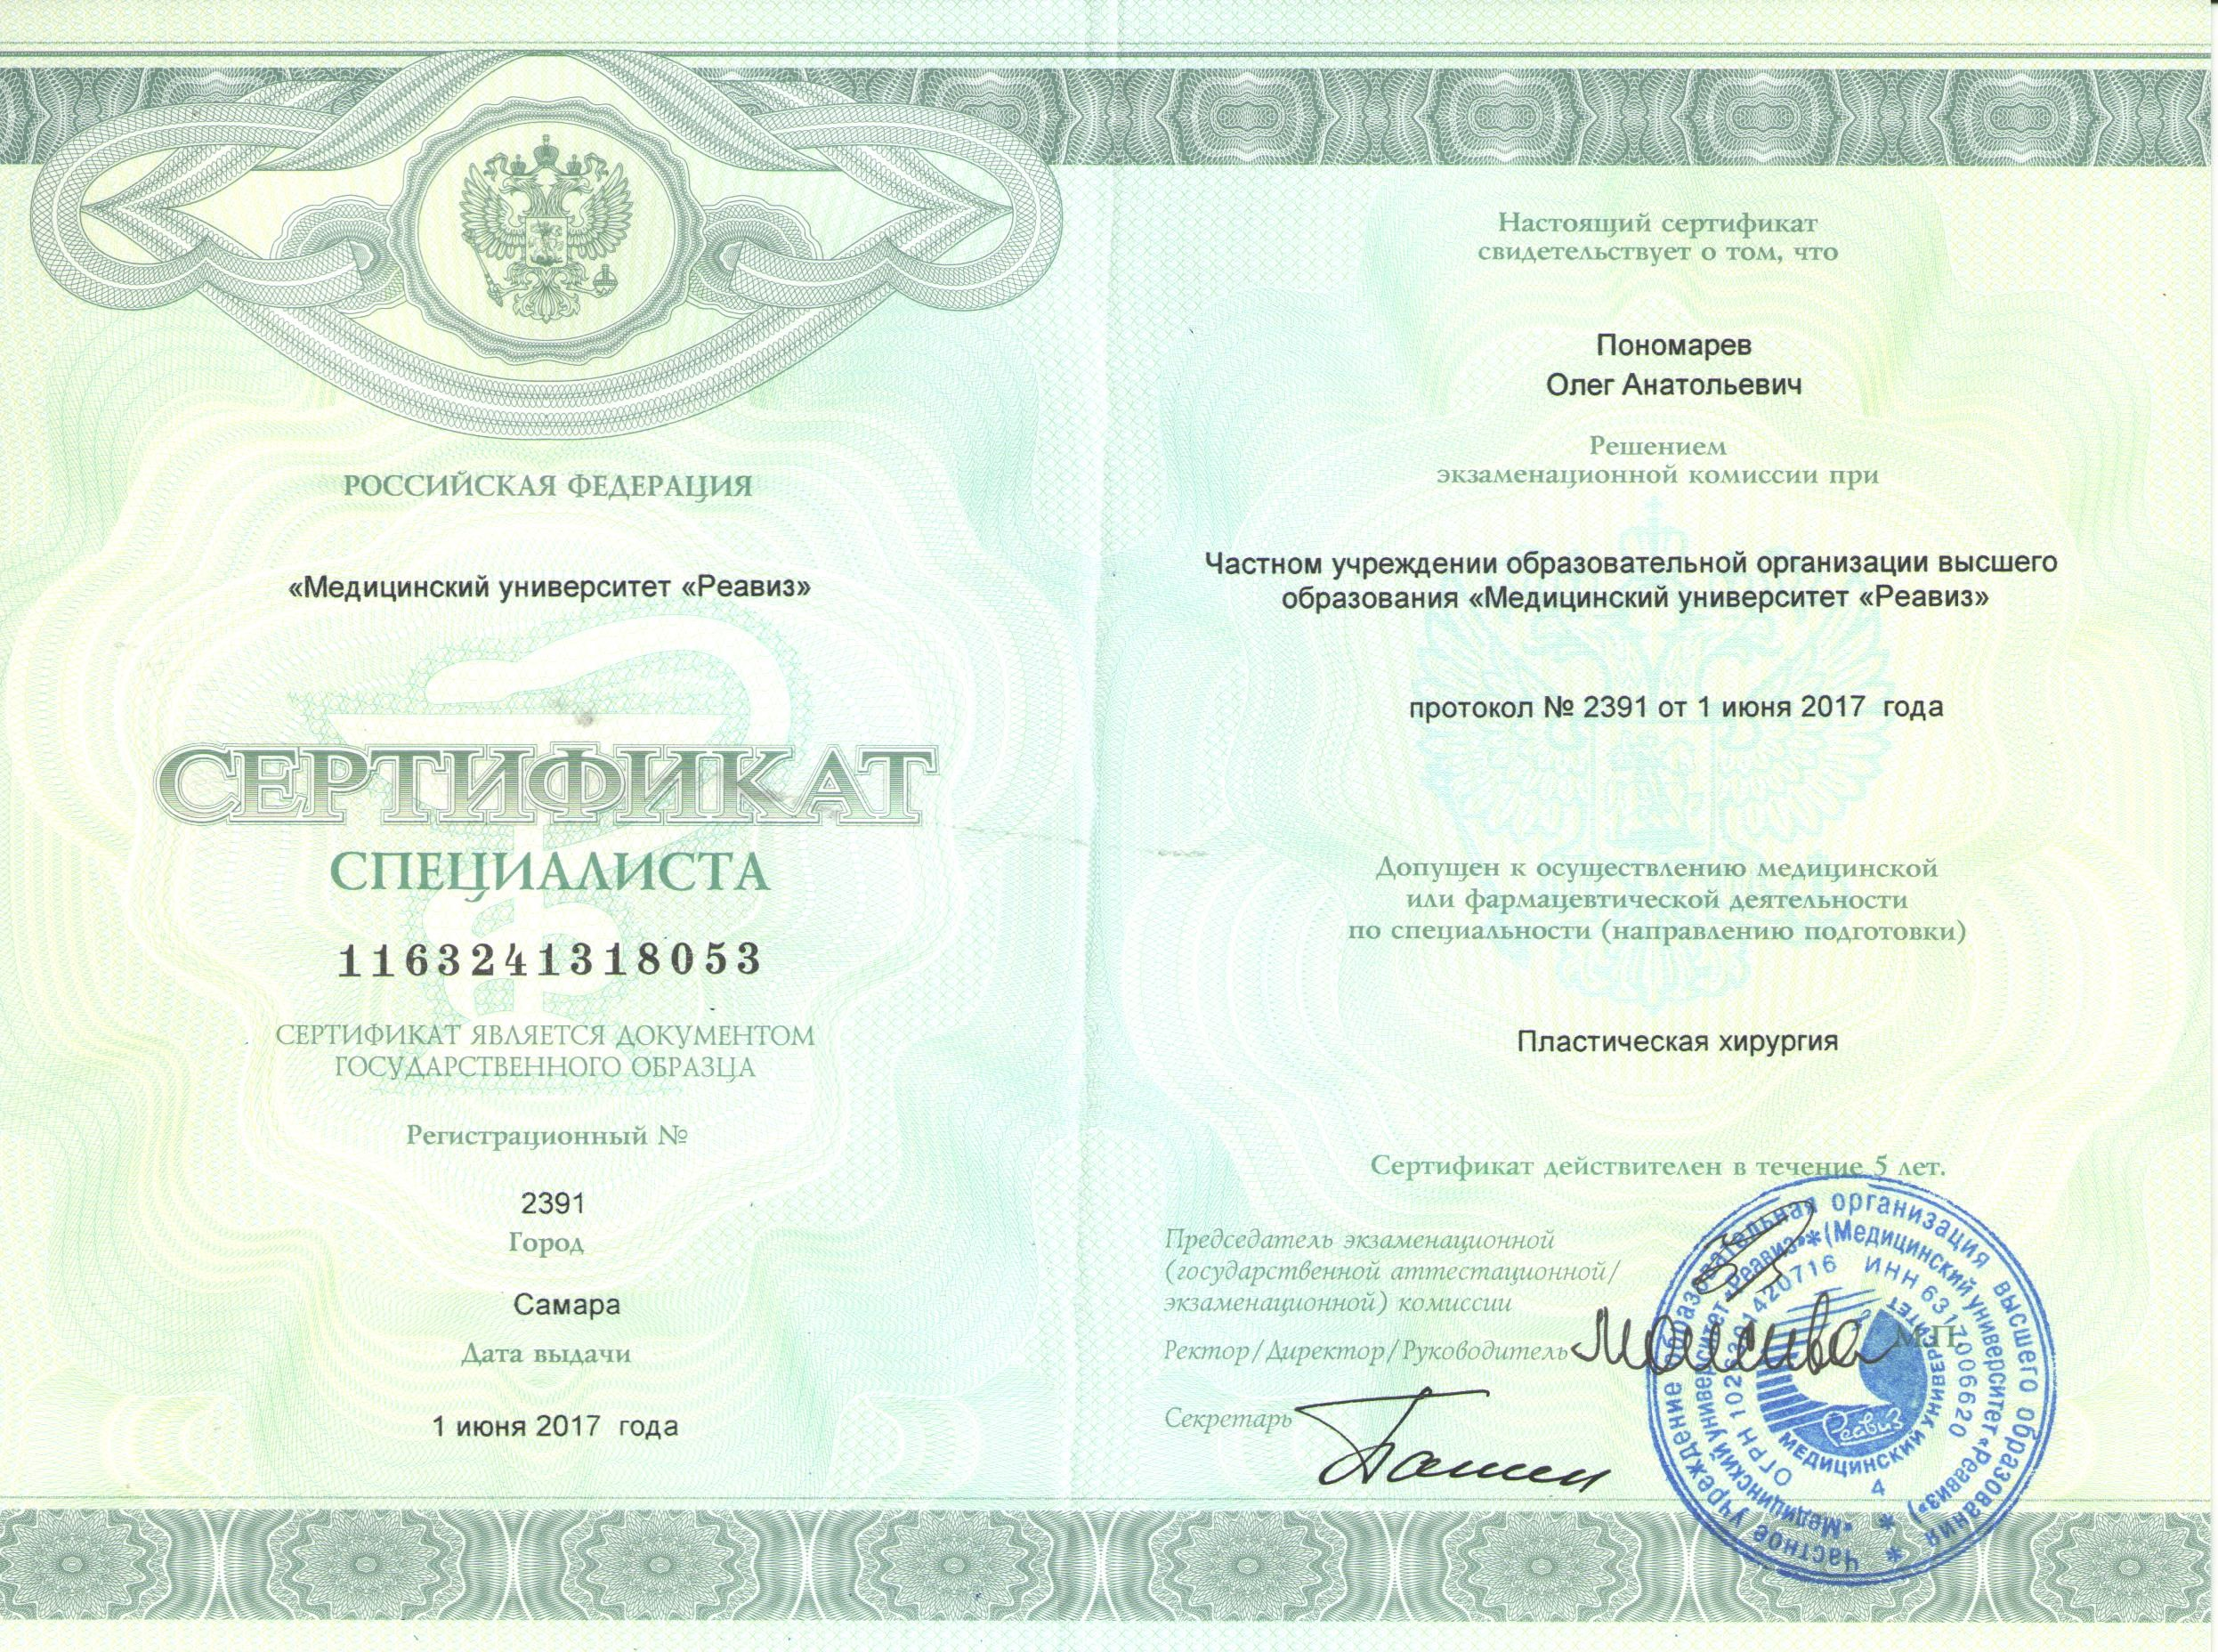 Сертификат специалиста пластической хирургии